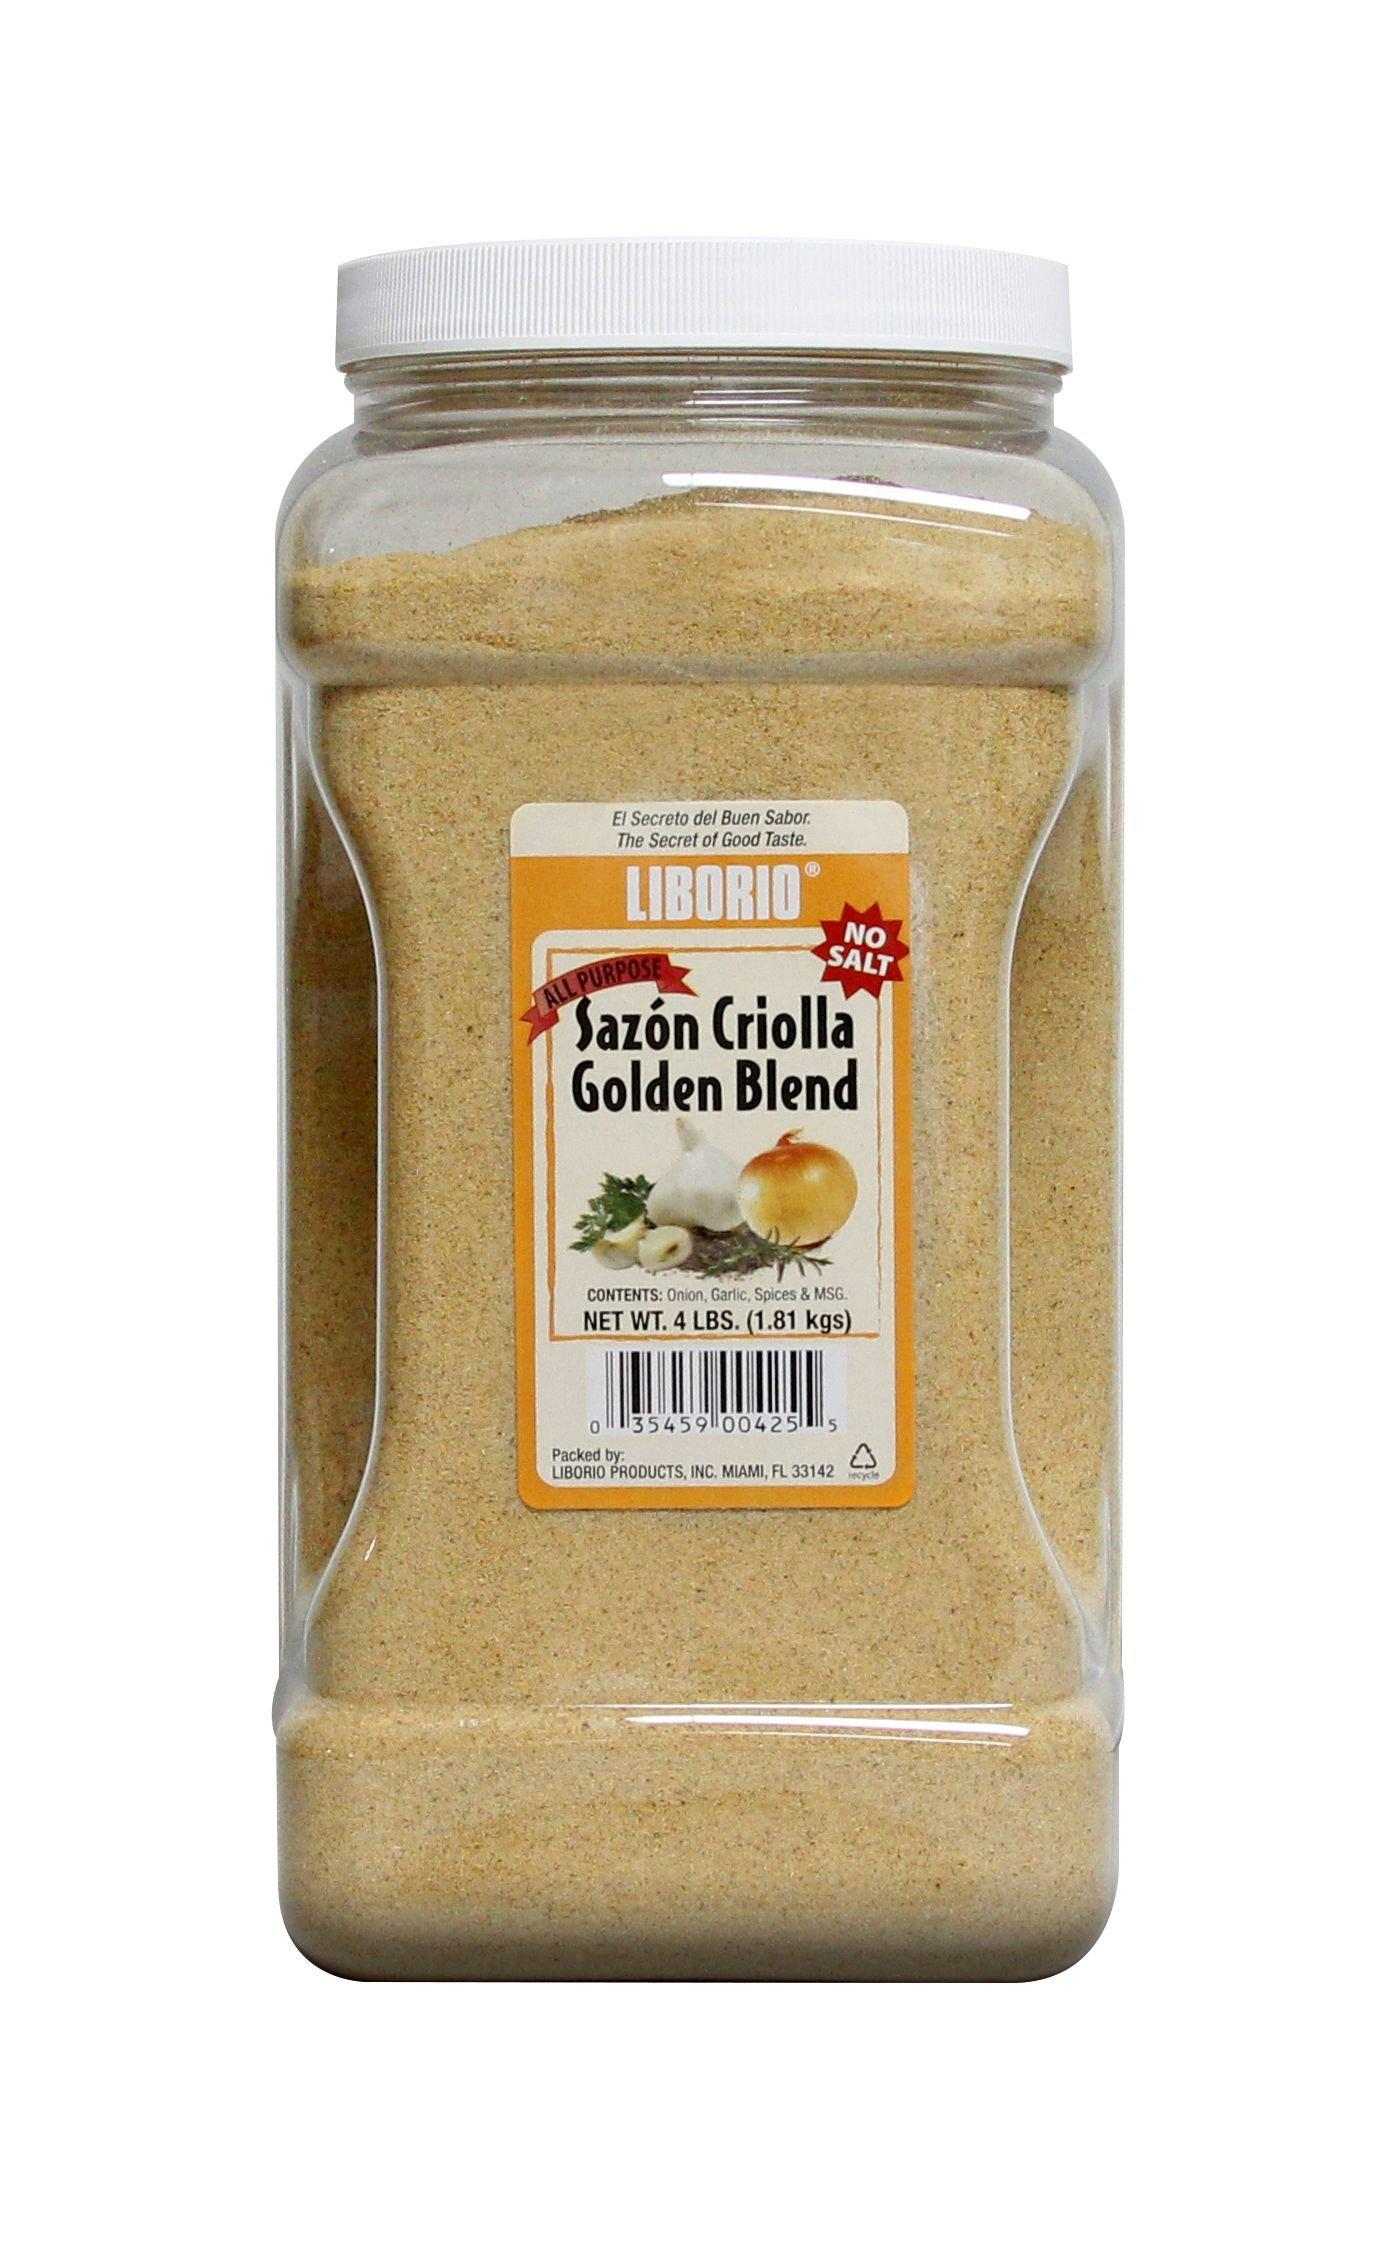 Liborio Sazón Gold All Purpose Seasoning, 4 lb